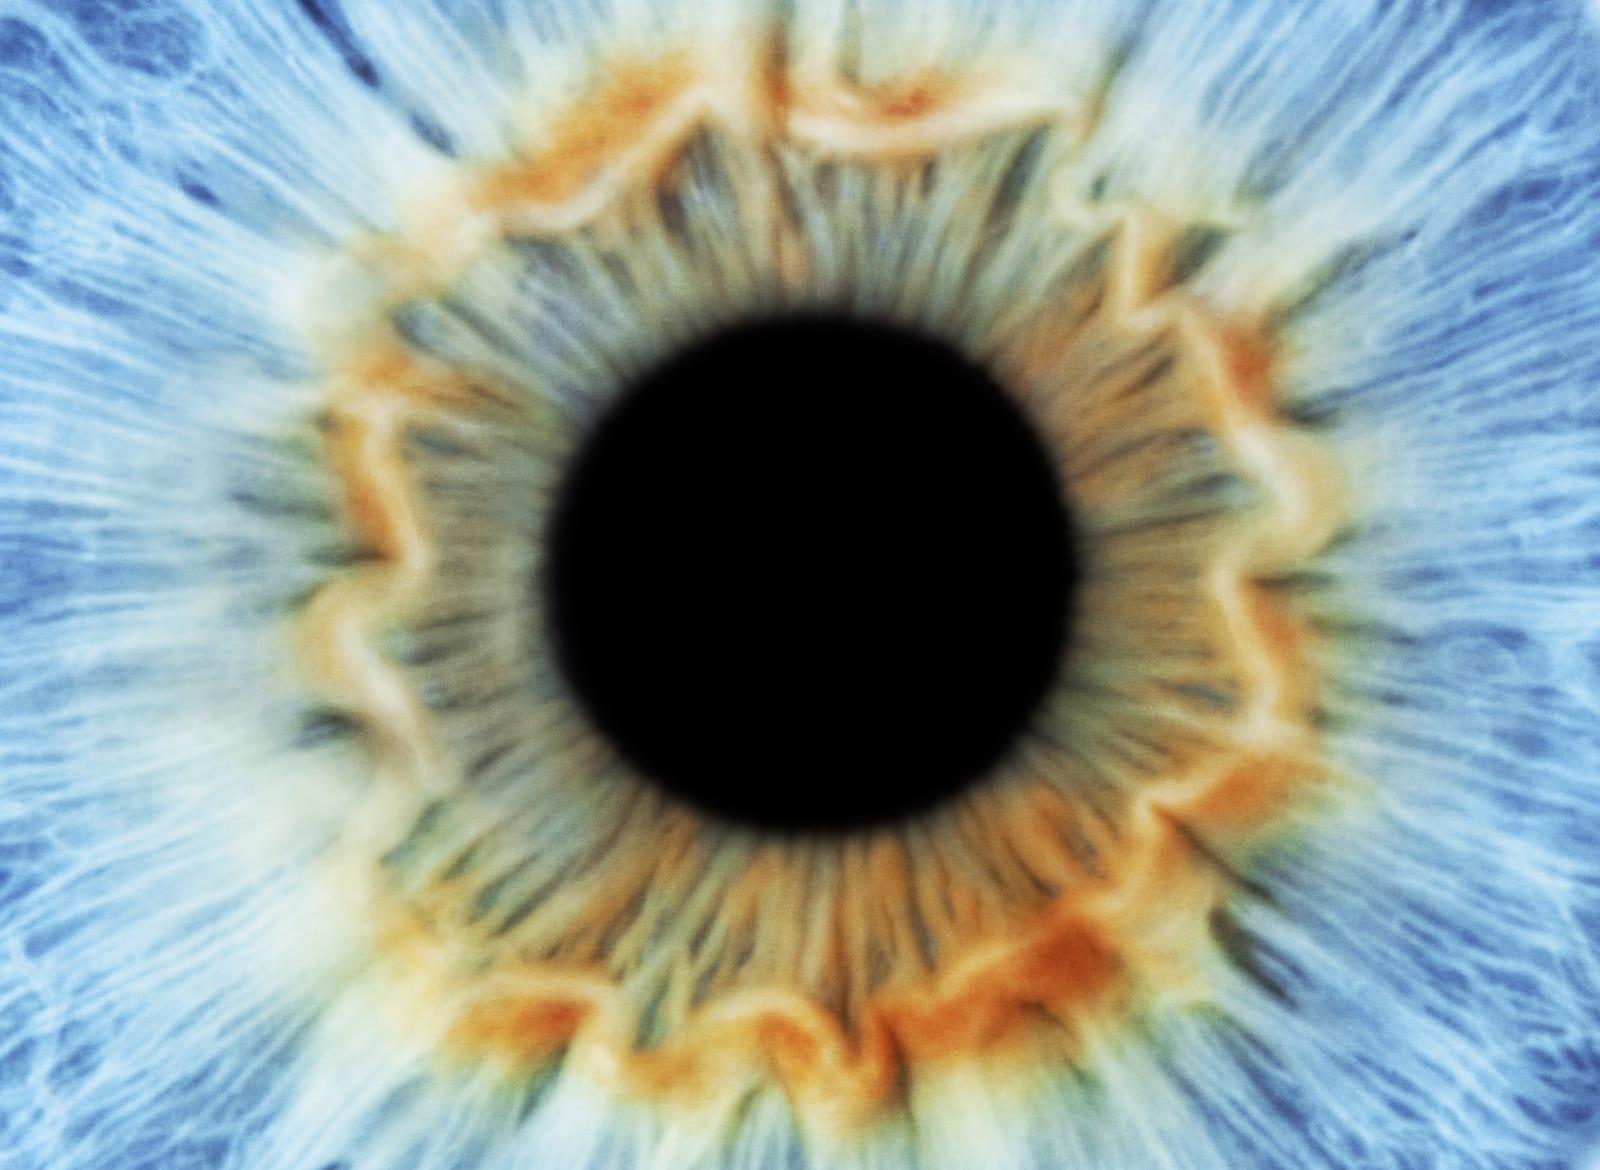 Artificial iris responds to light like real eyes